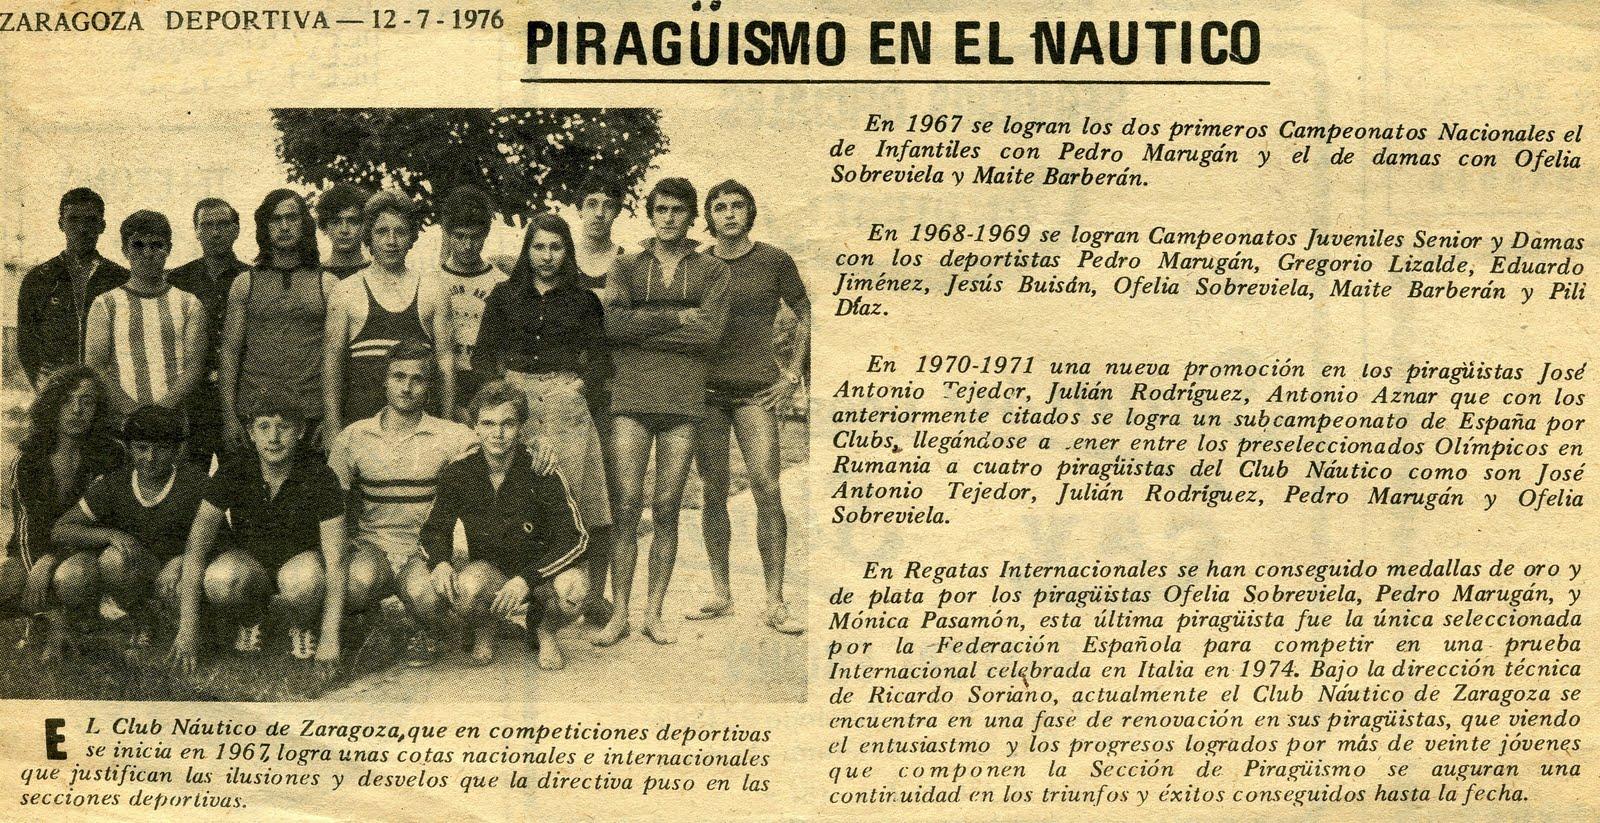 Club n utico zaragoza fallece el piraguista zaragozano ricardo soriano huera - Club nautico zaragoza ...